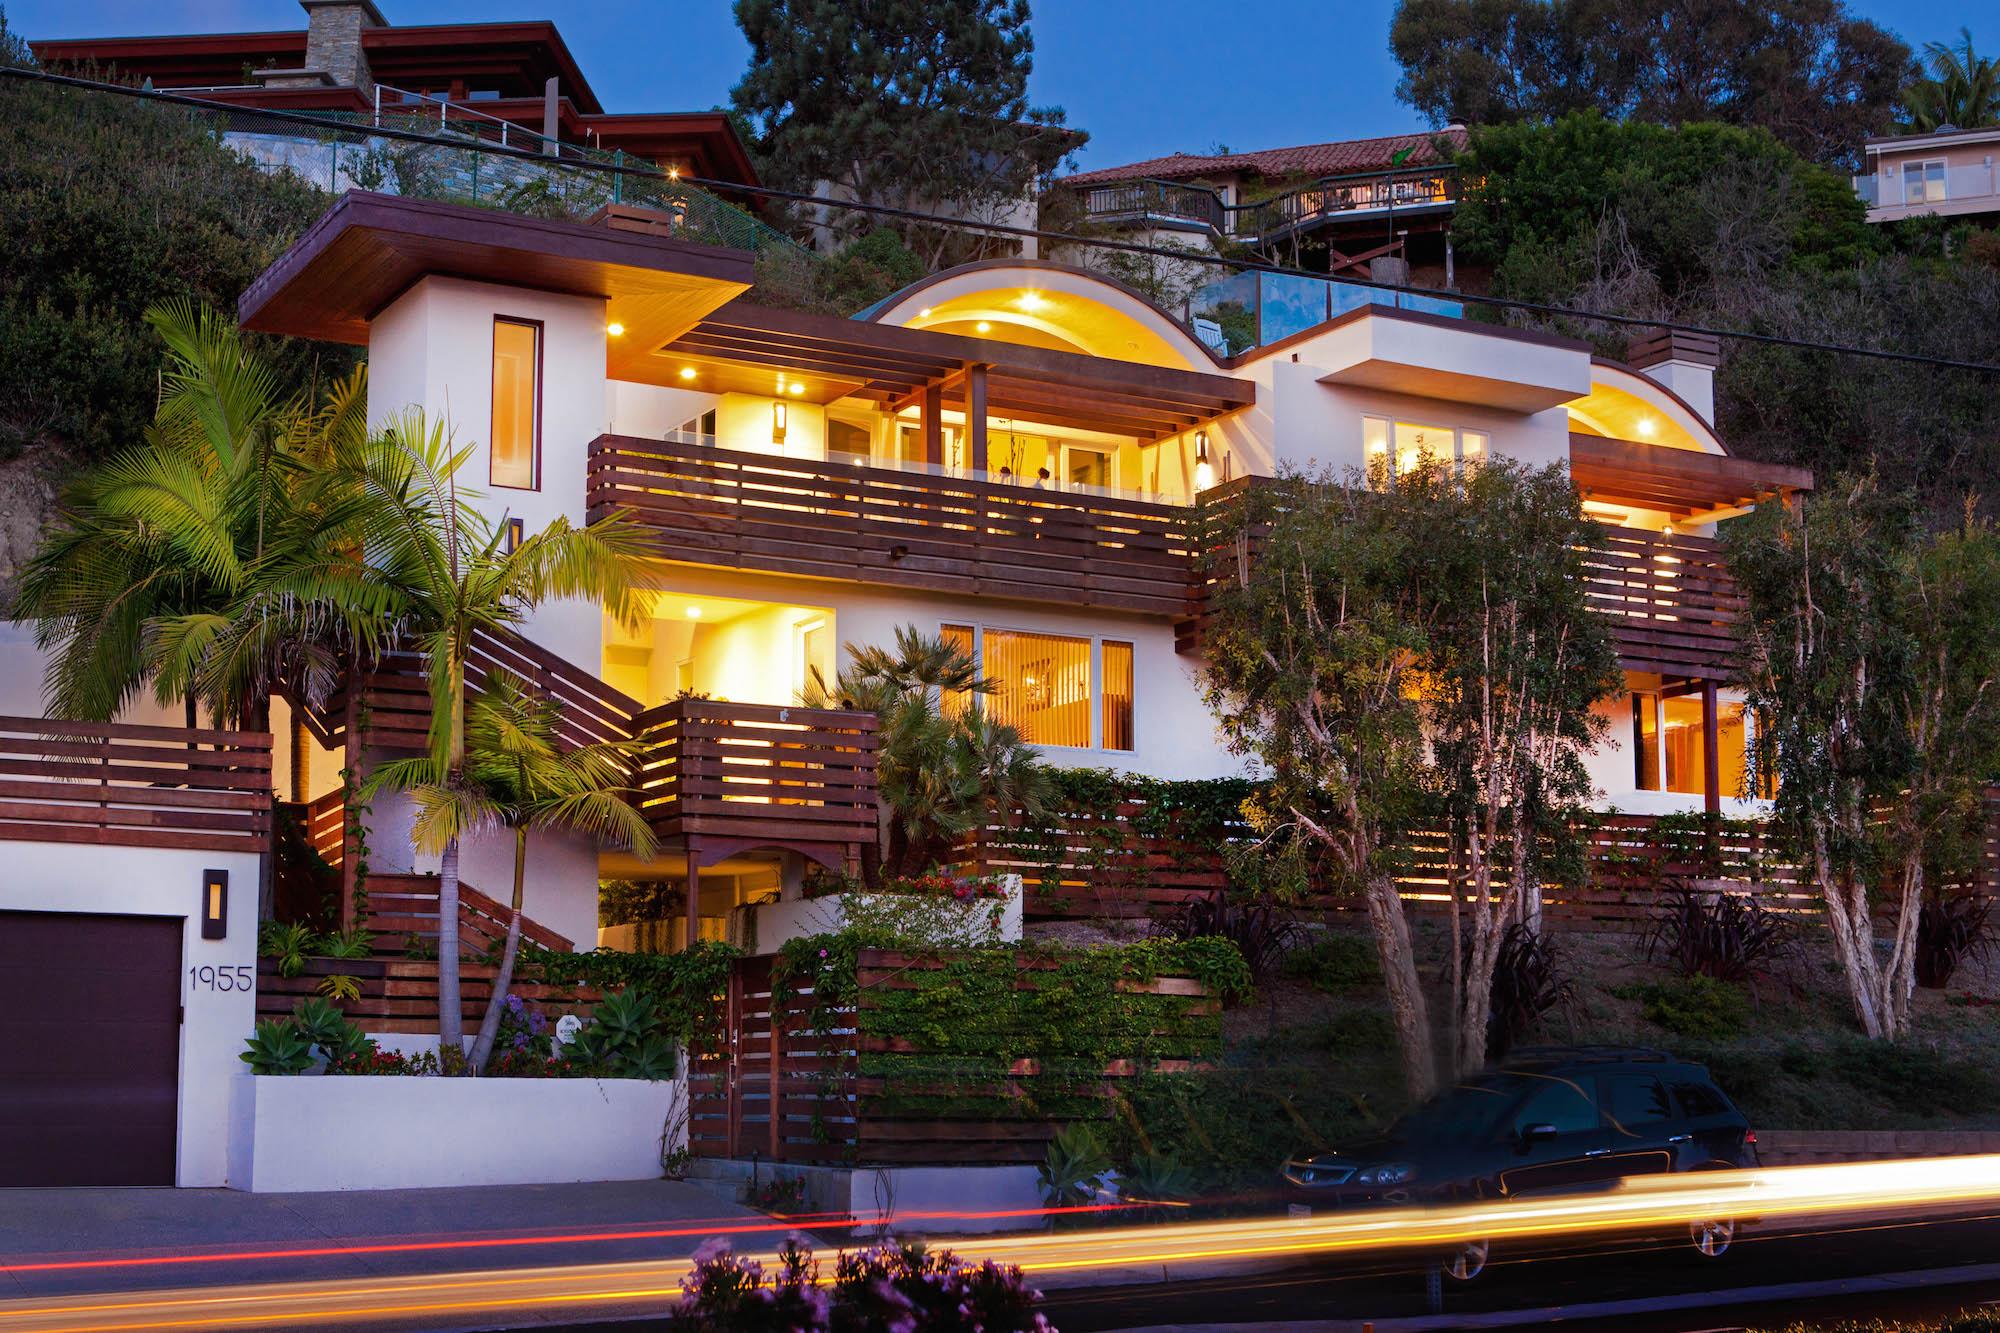 Nuances of luxury san diego real estate market - Mar real estate ...